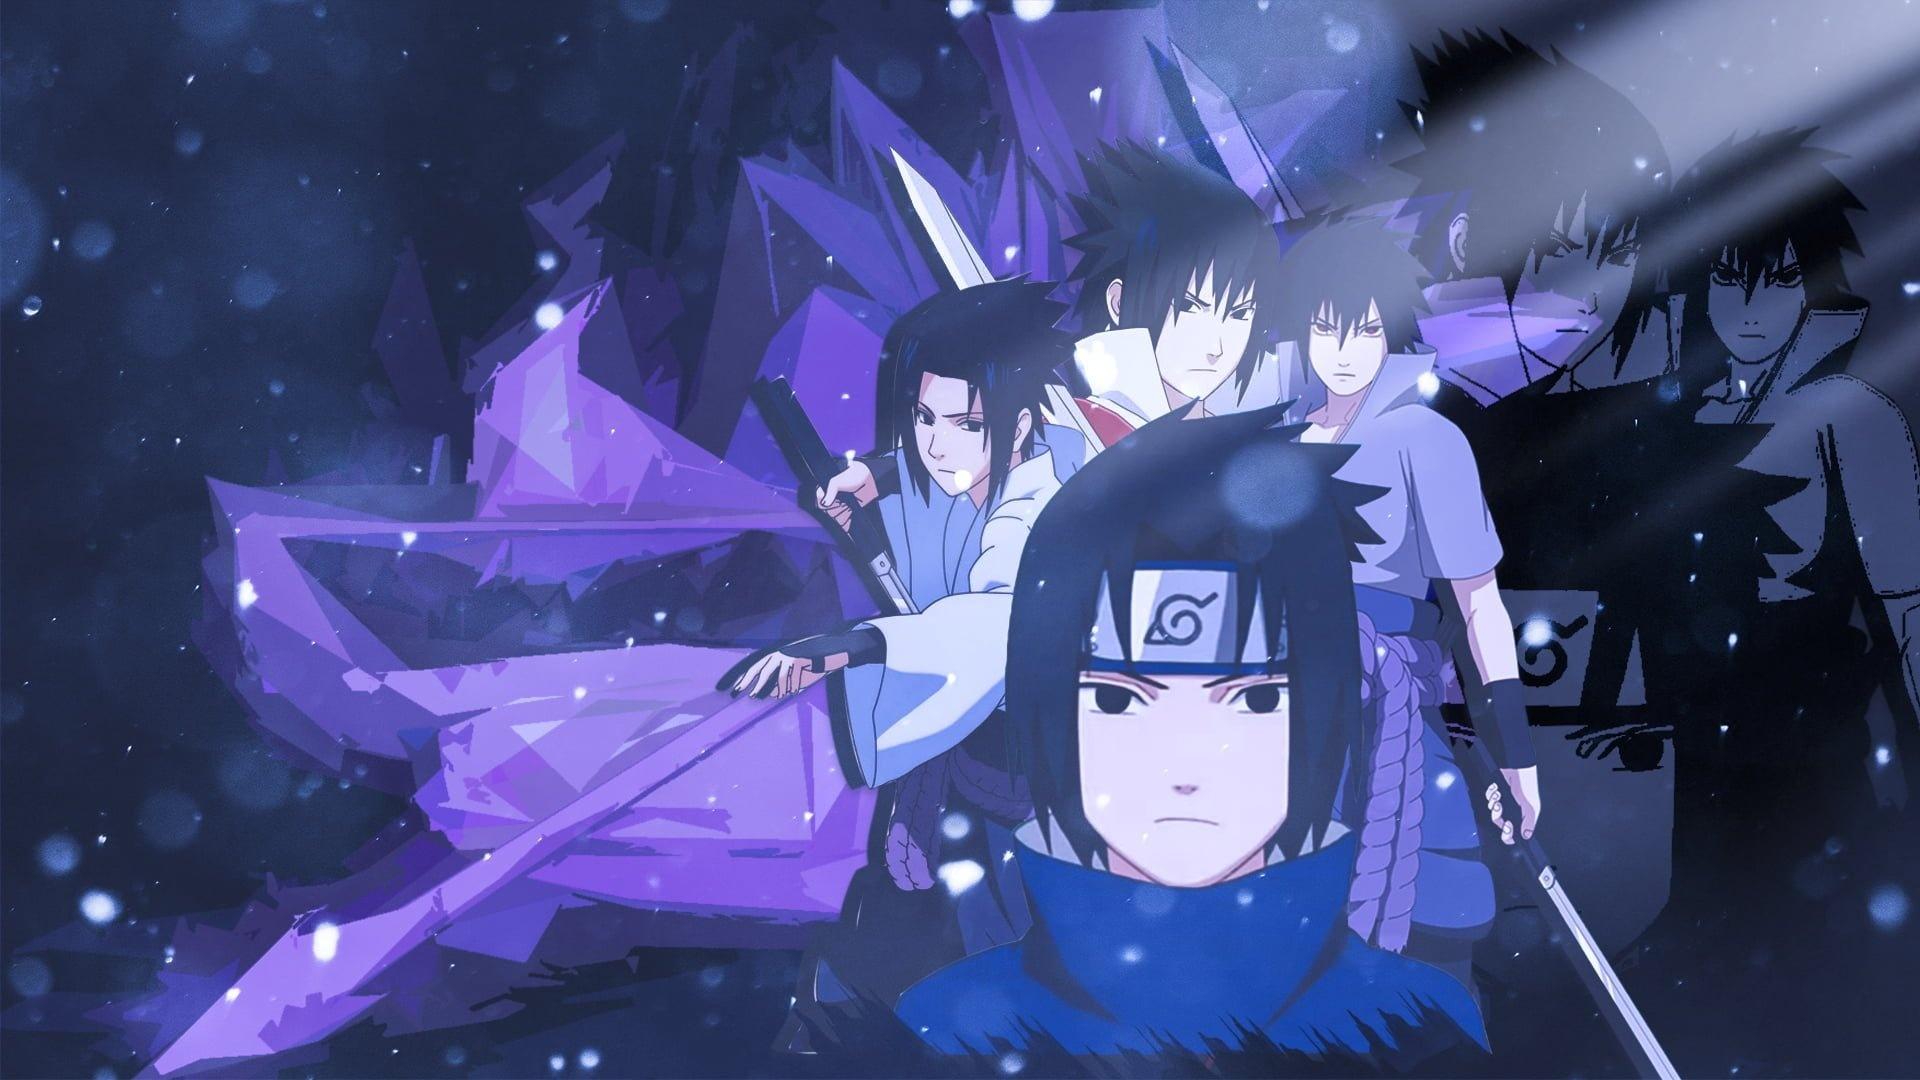 Sasuke free image